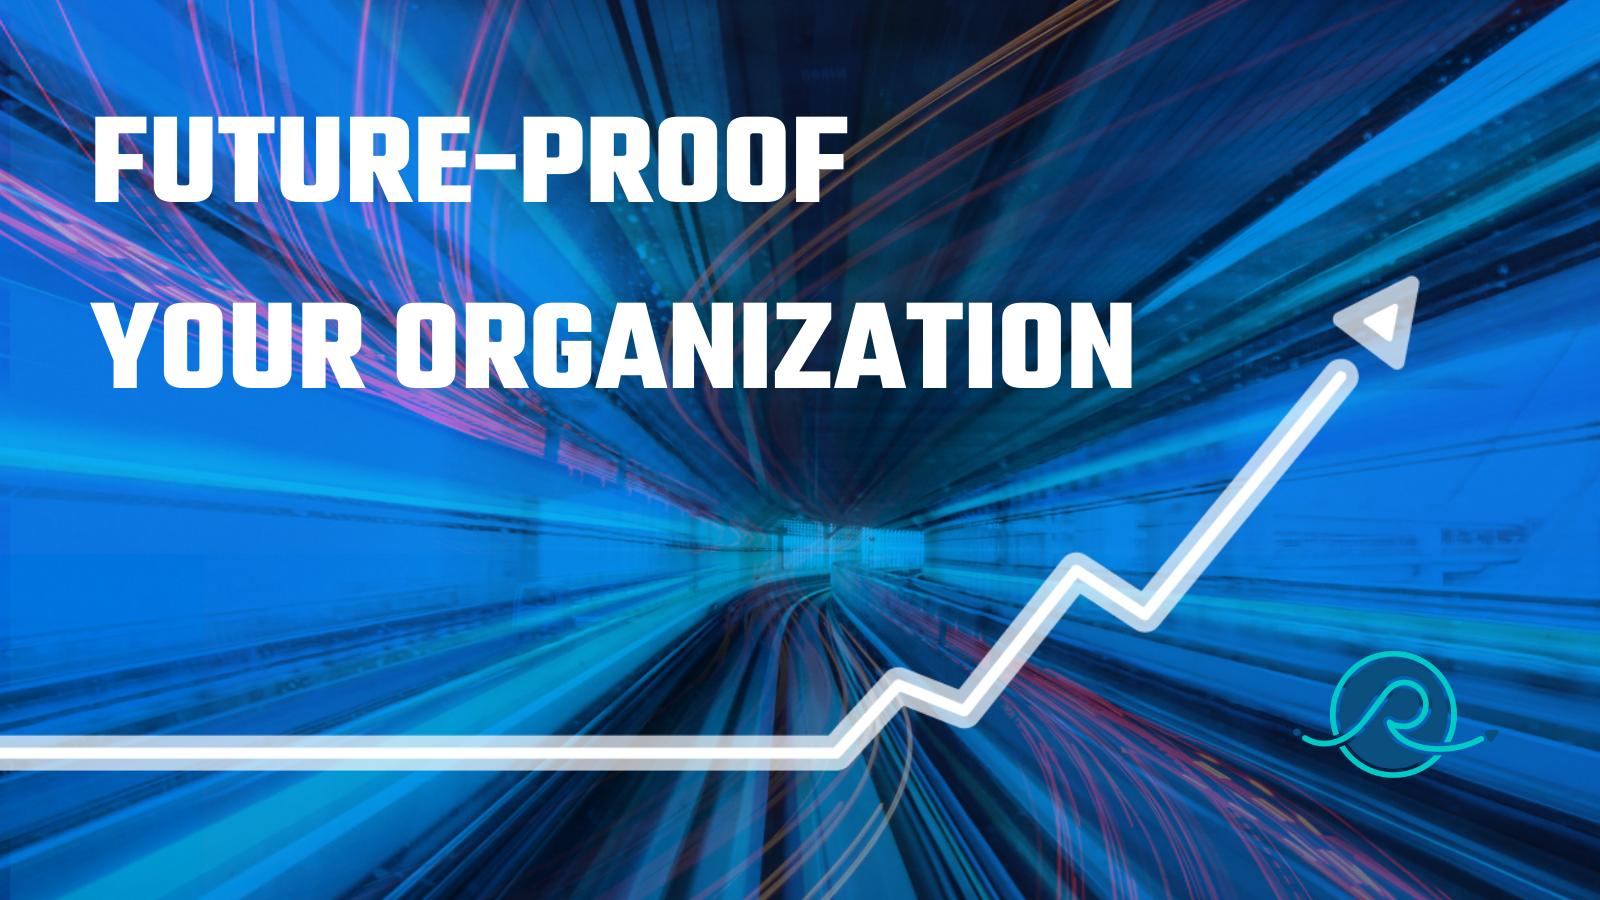 FUTURE-PROOF YOUR ORGANIZATION